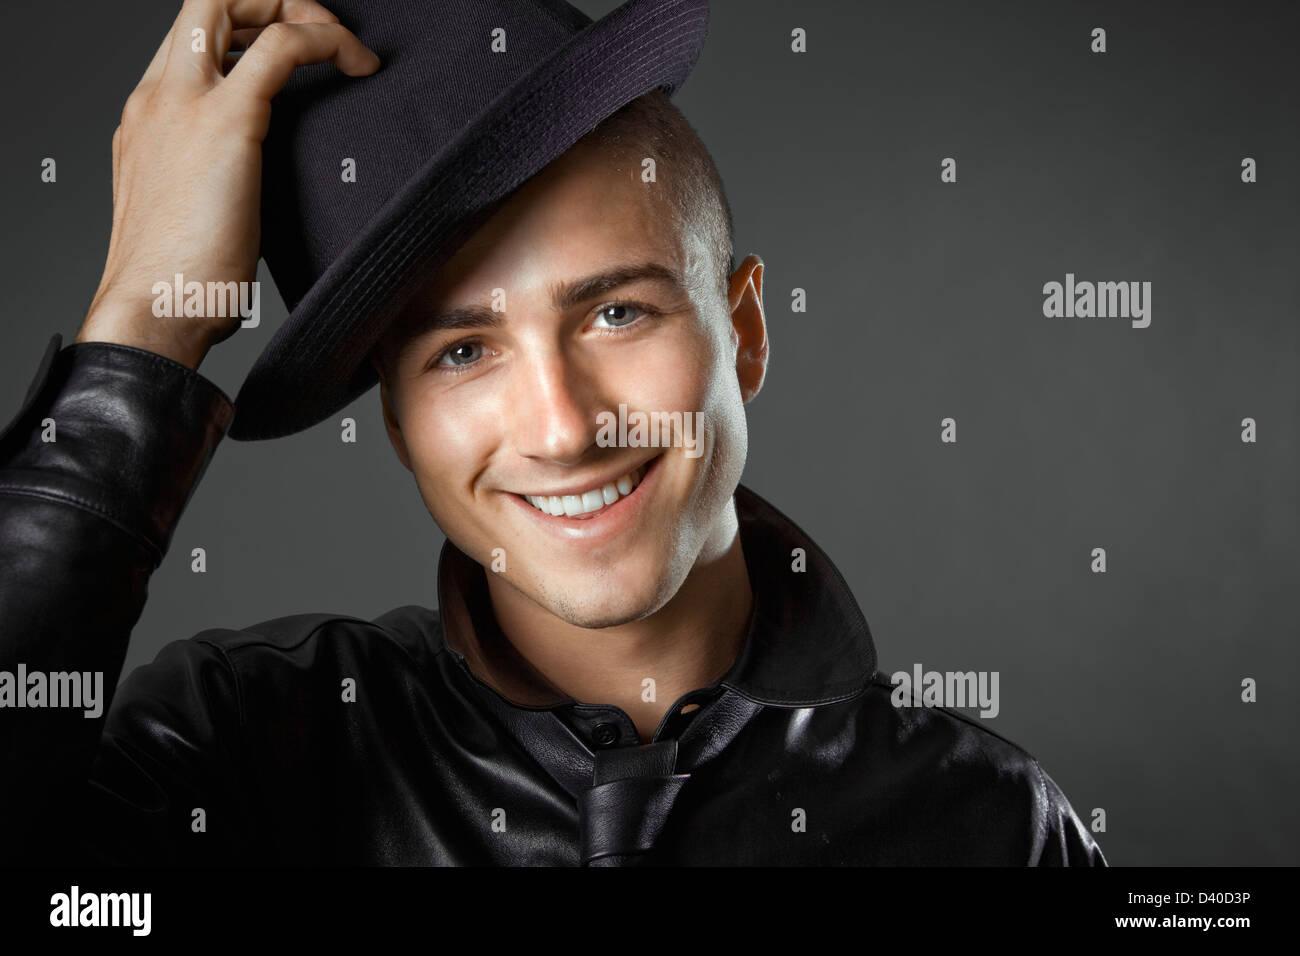 Joven Hombre caucásico en la moda masculina foto tomada en studio Imagen De Stock